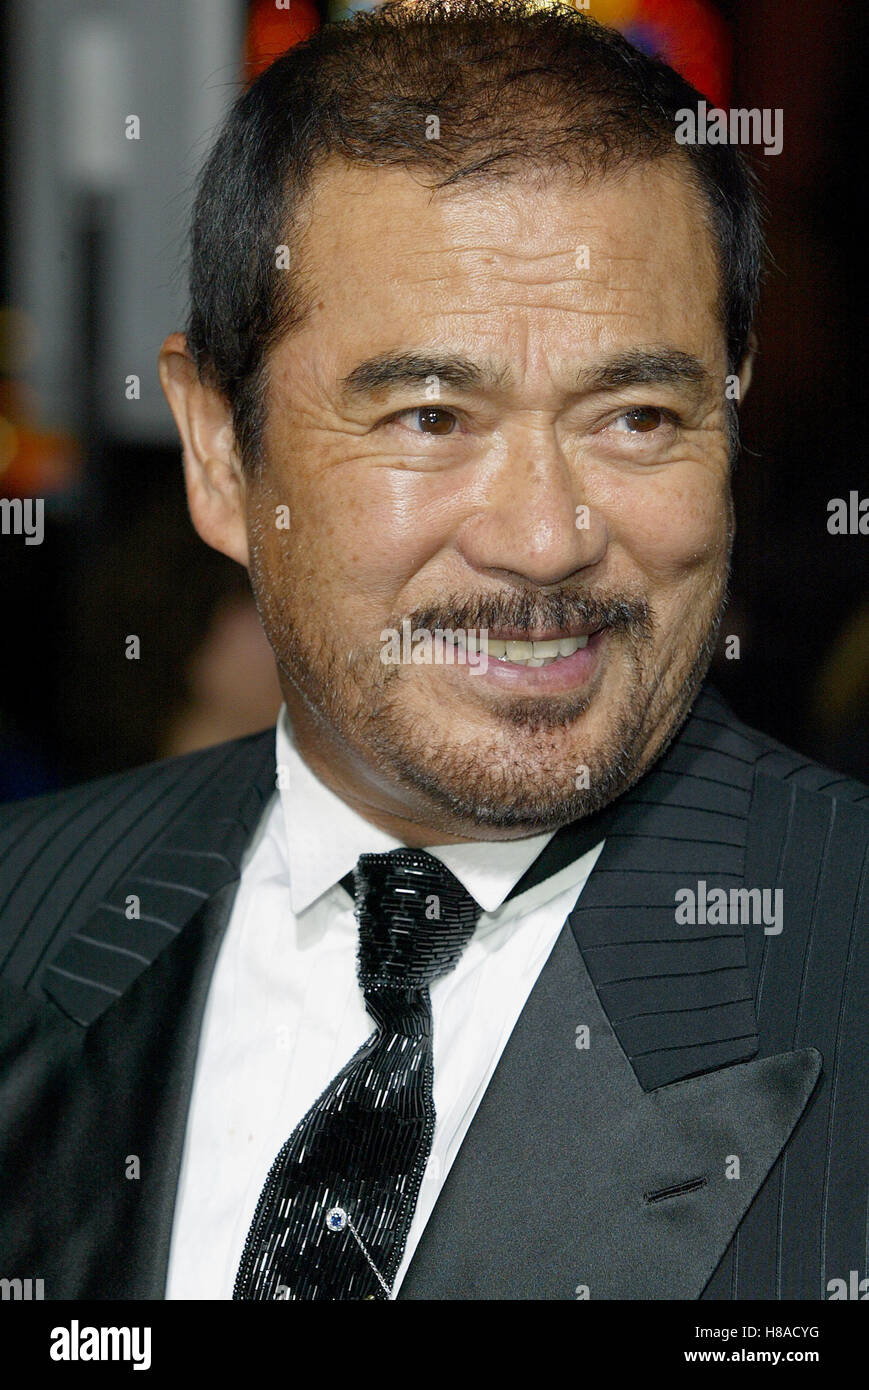 Sonny Chiba - Wikipedia